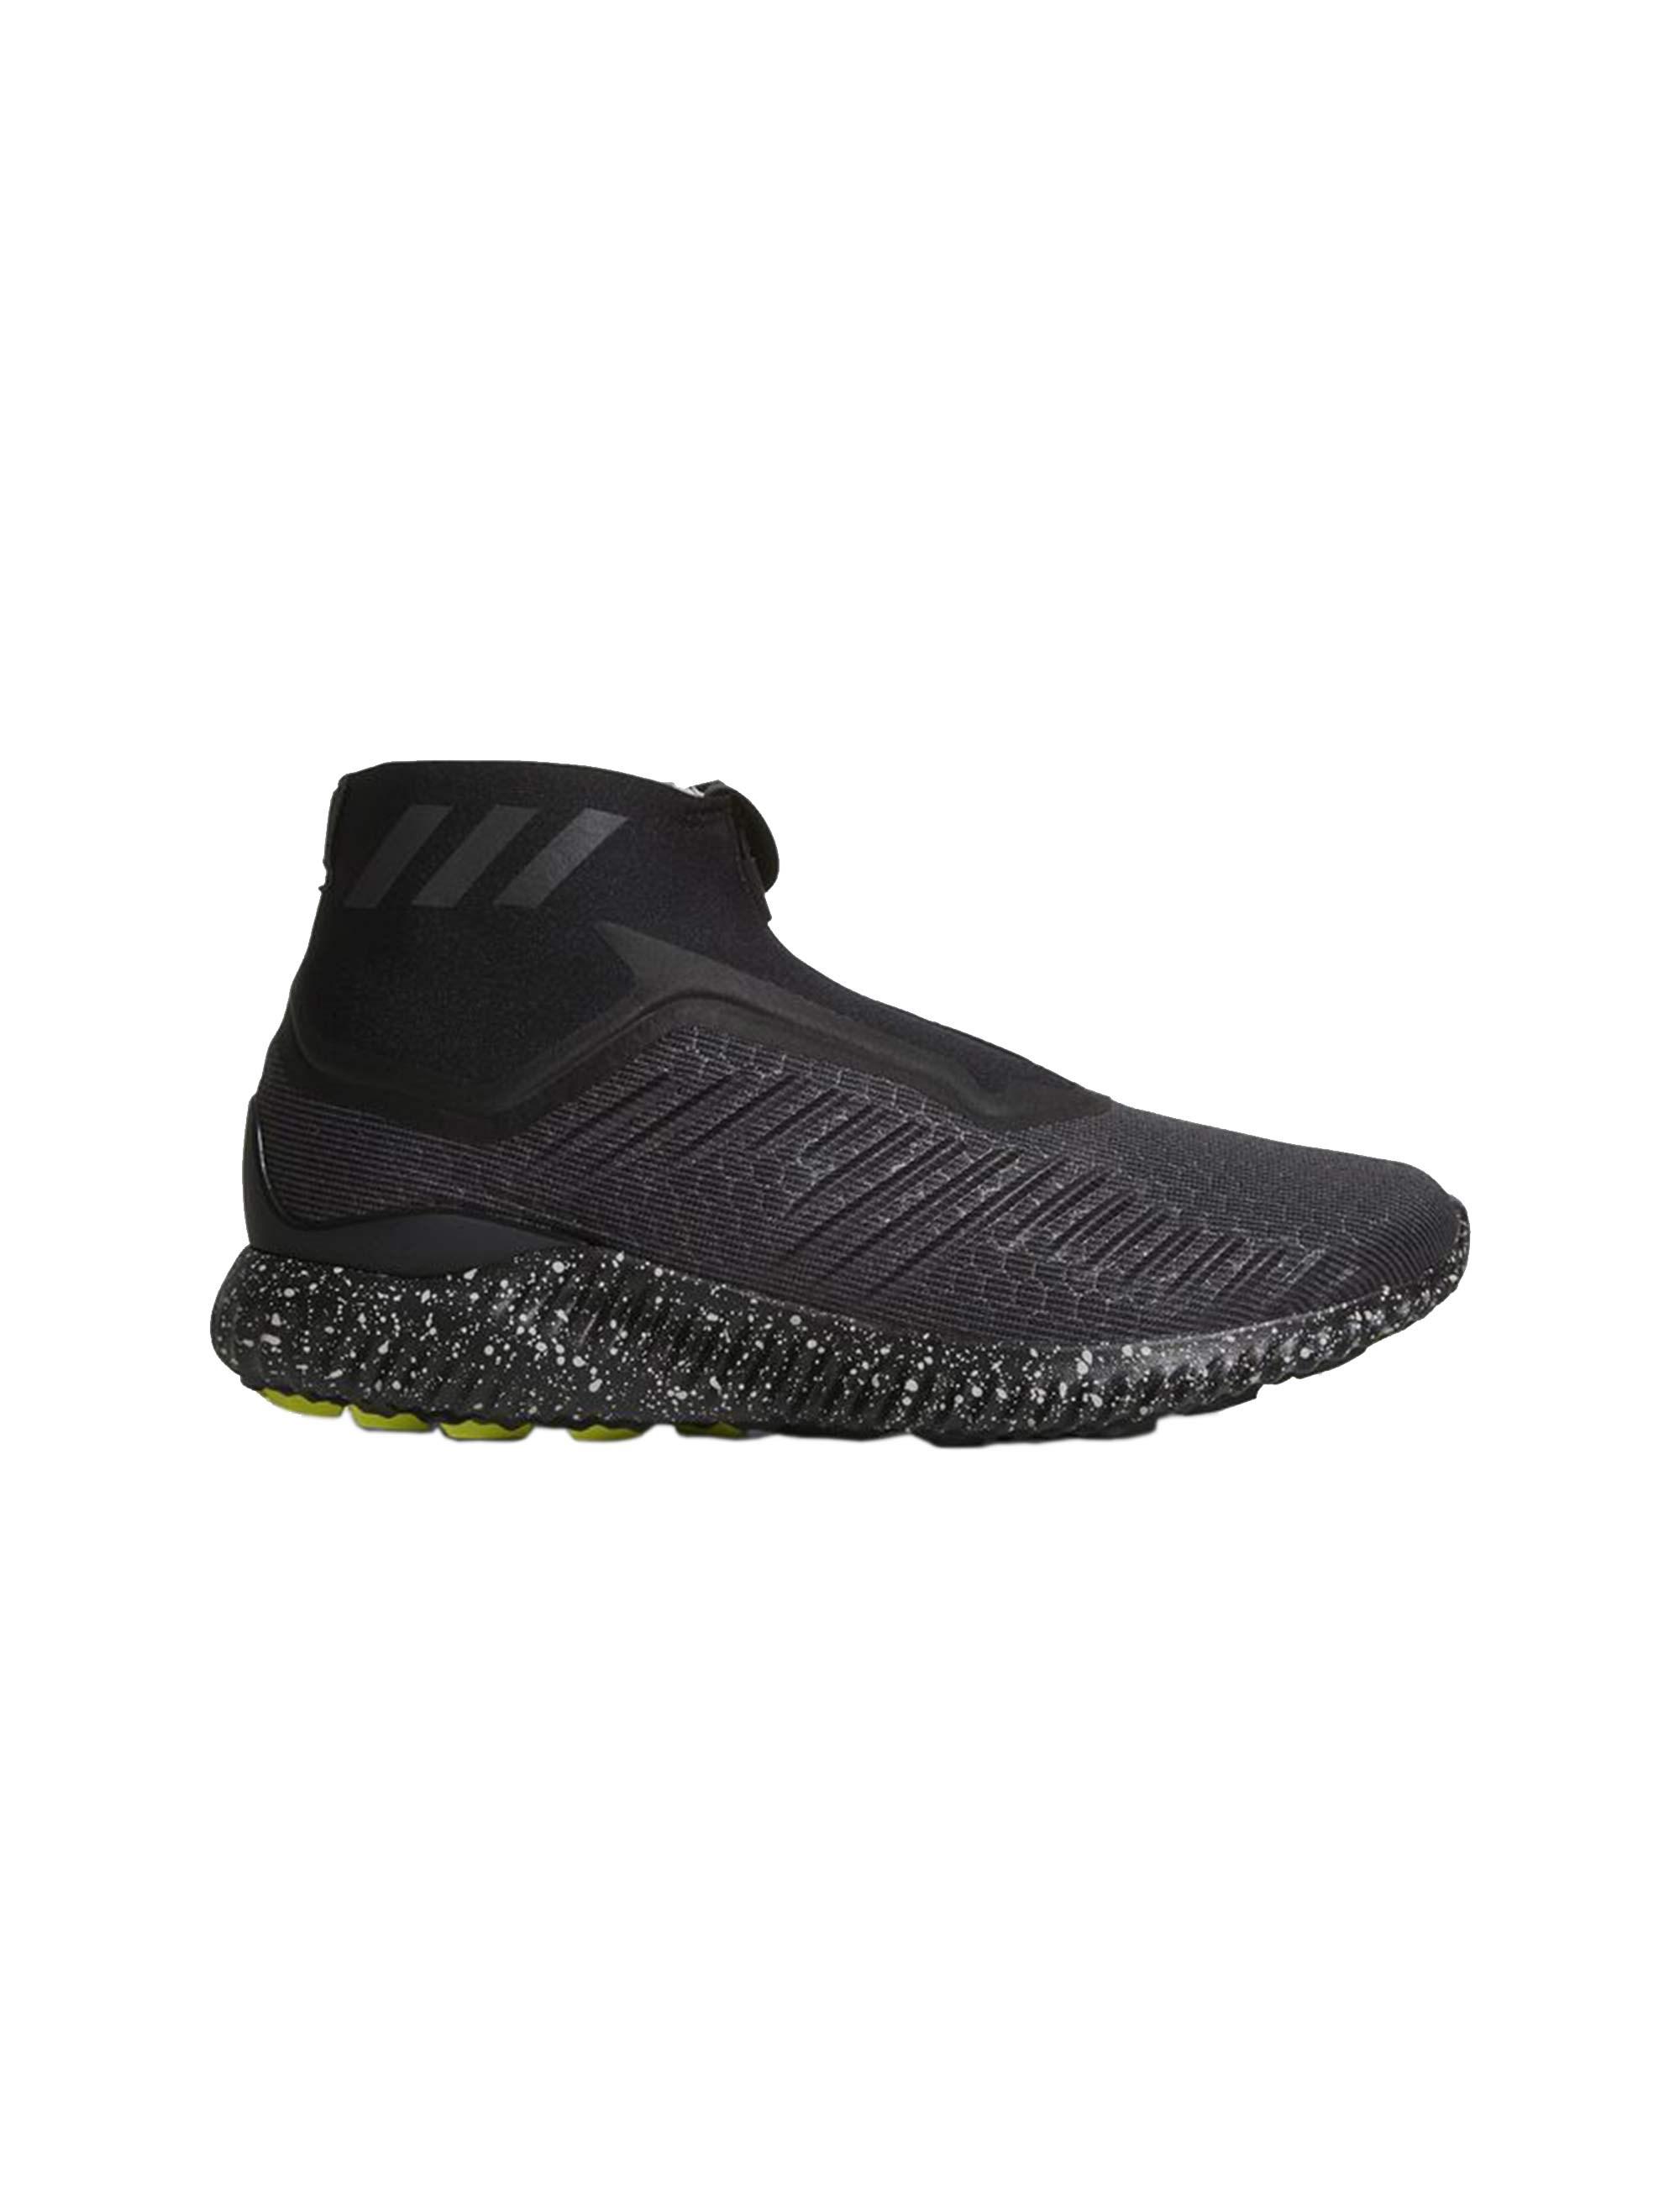 کفش دویدن زیپ دار مردانه Alphabounce 5-8 - آدیداس